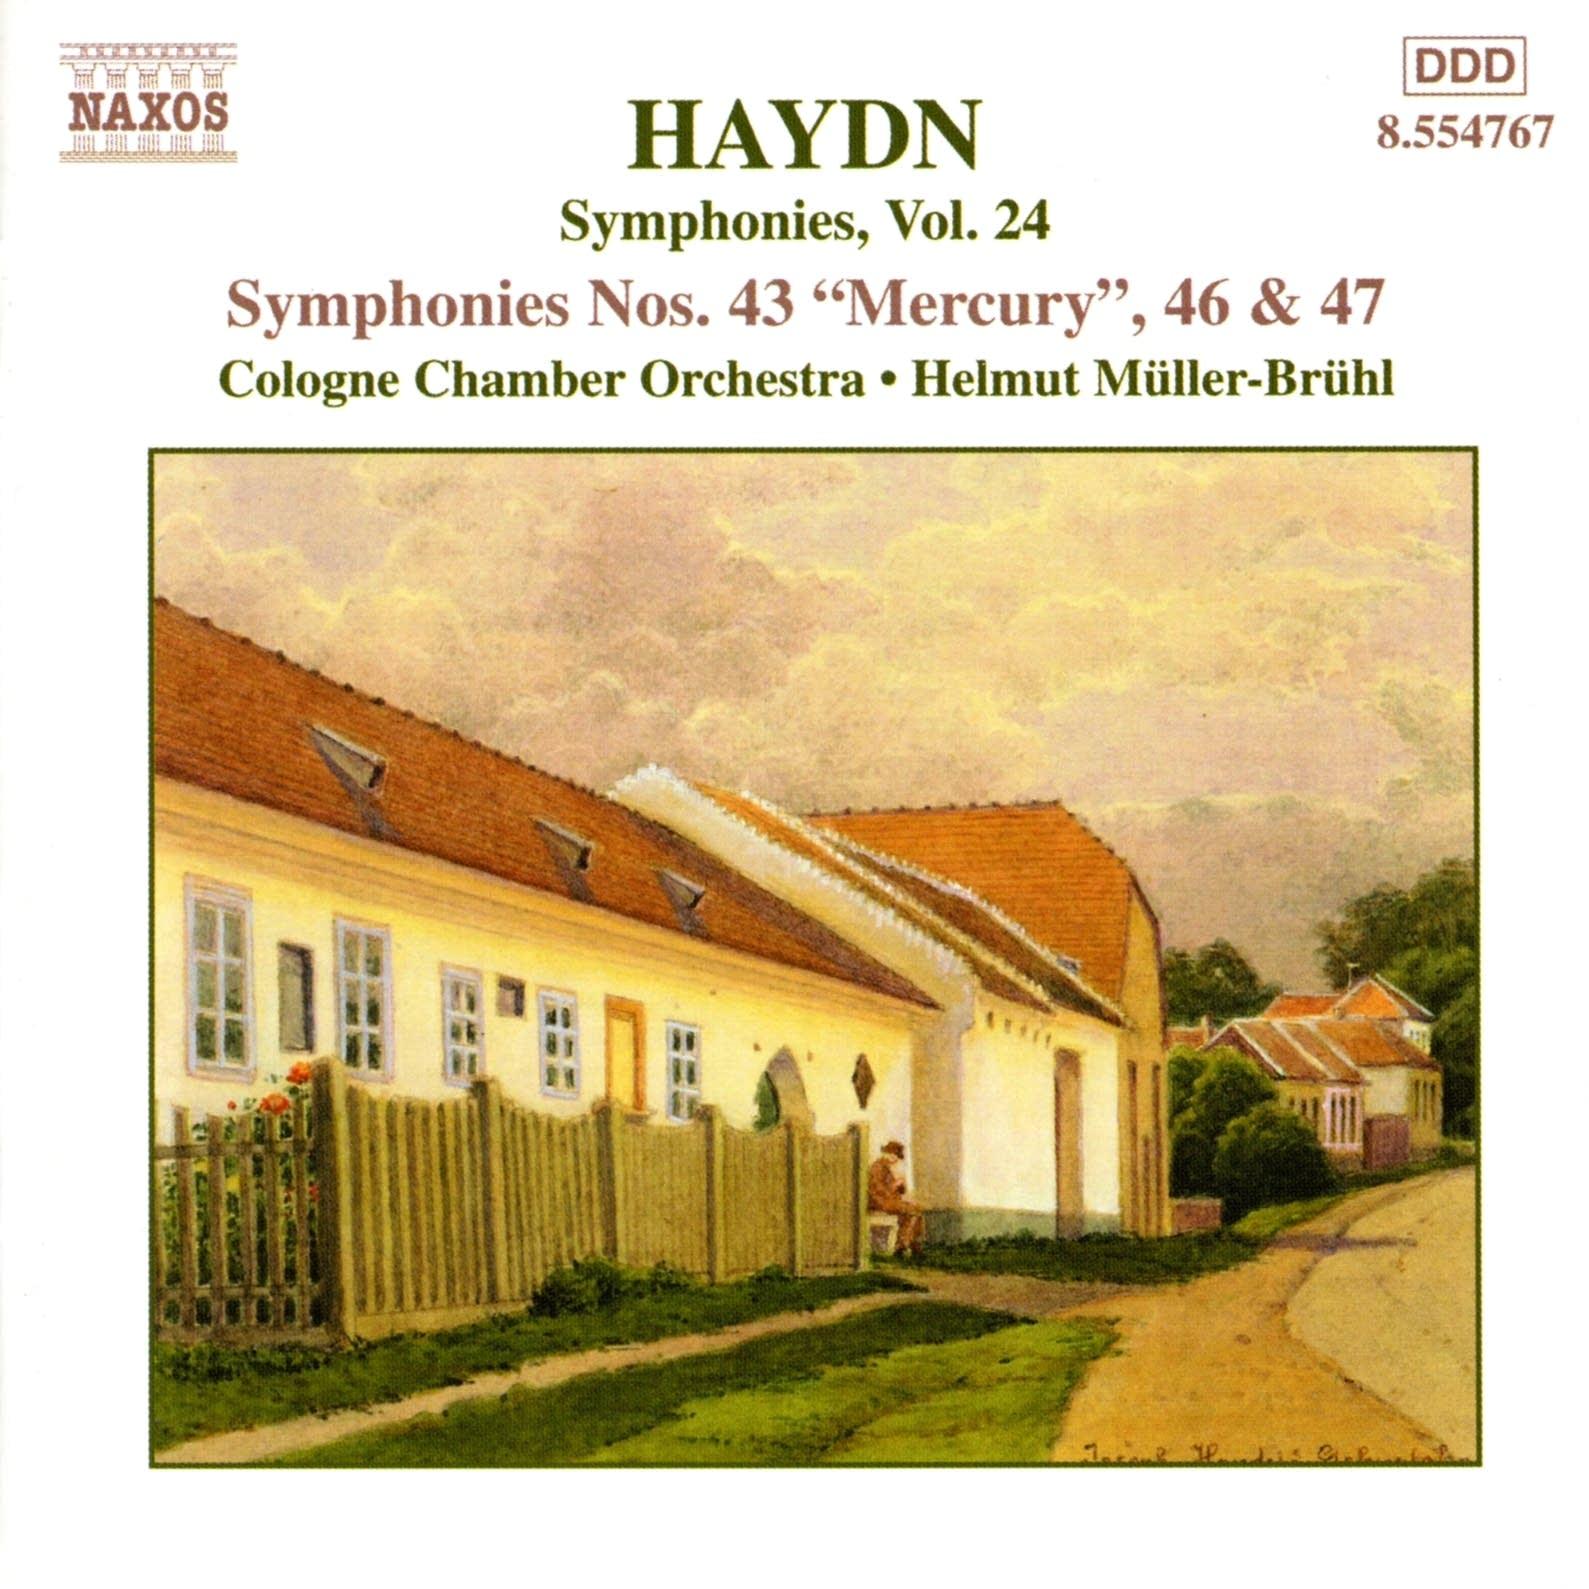 Haydn Symphonies Vol. 24